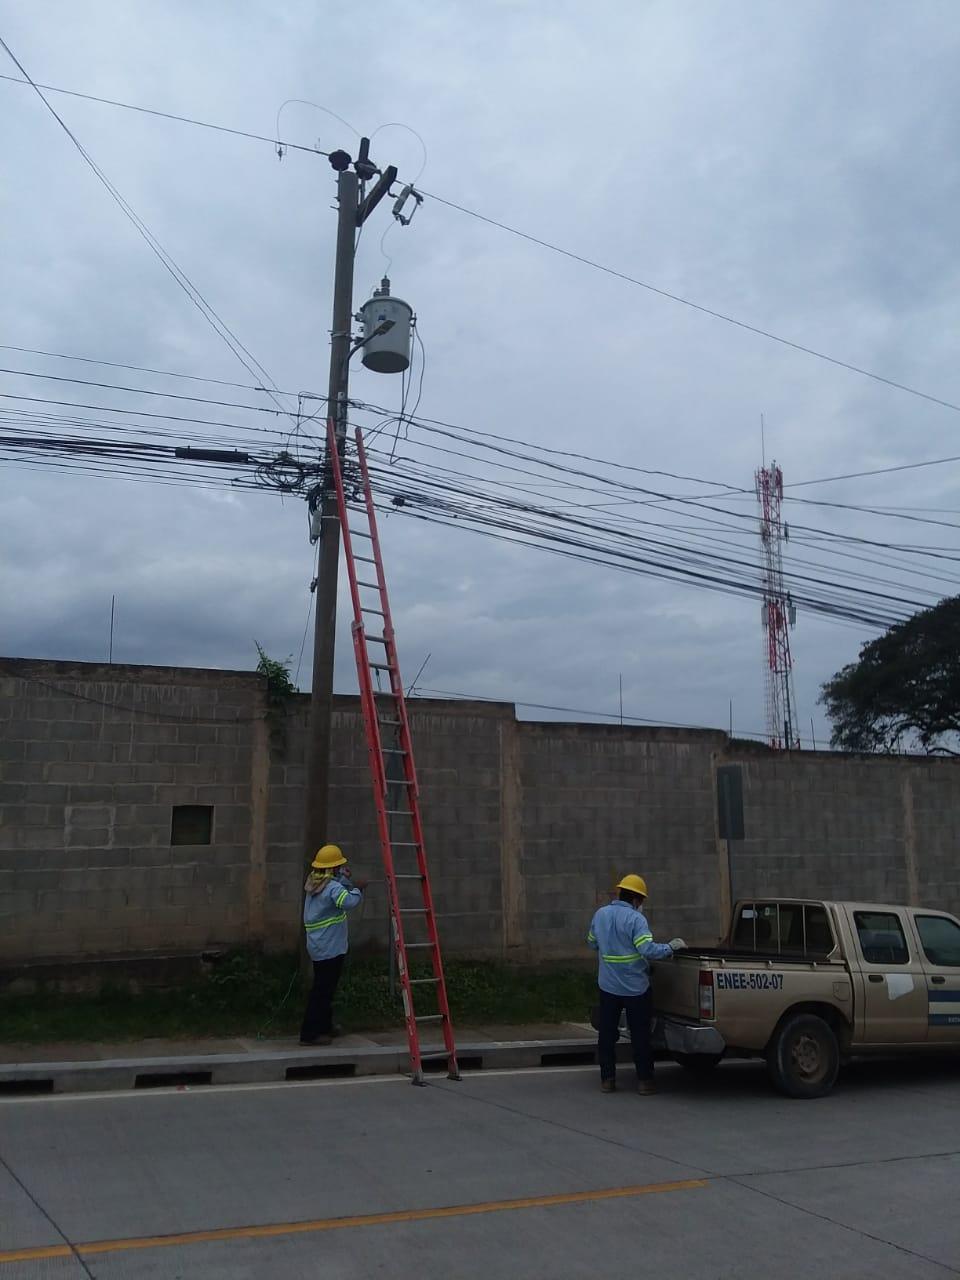 ENEE ilumina barrios y colonias de Gracias, Lempira